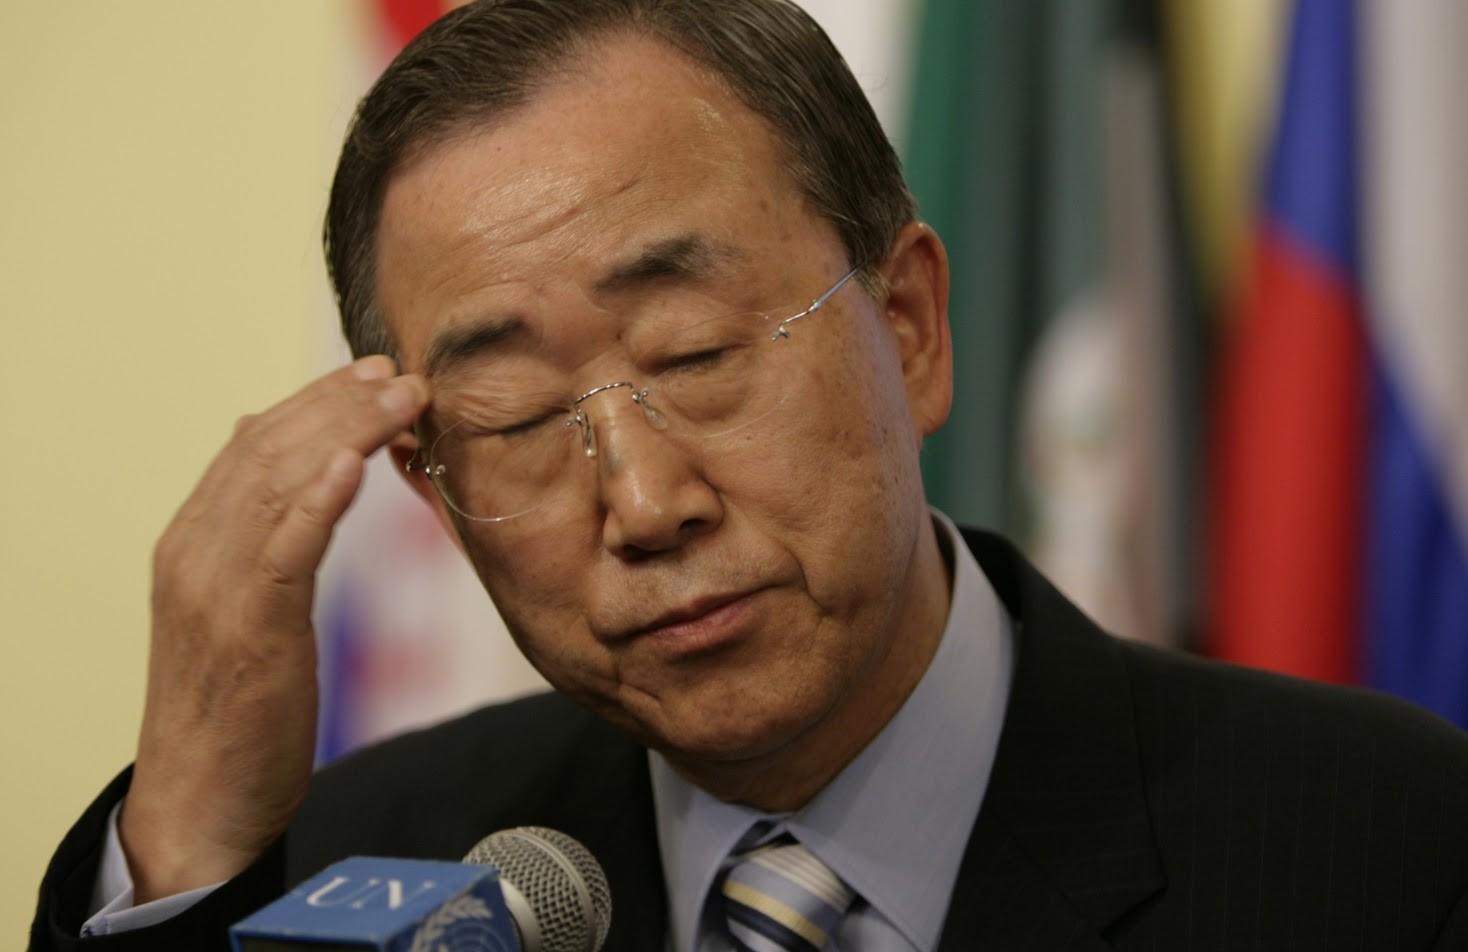 UN Secretary General Ban Ki-moon (Courtesy UN photo)